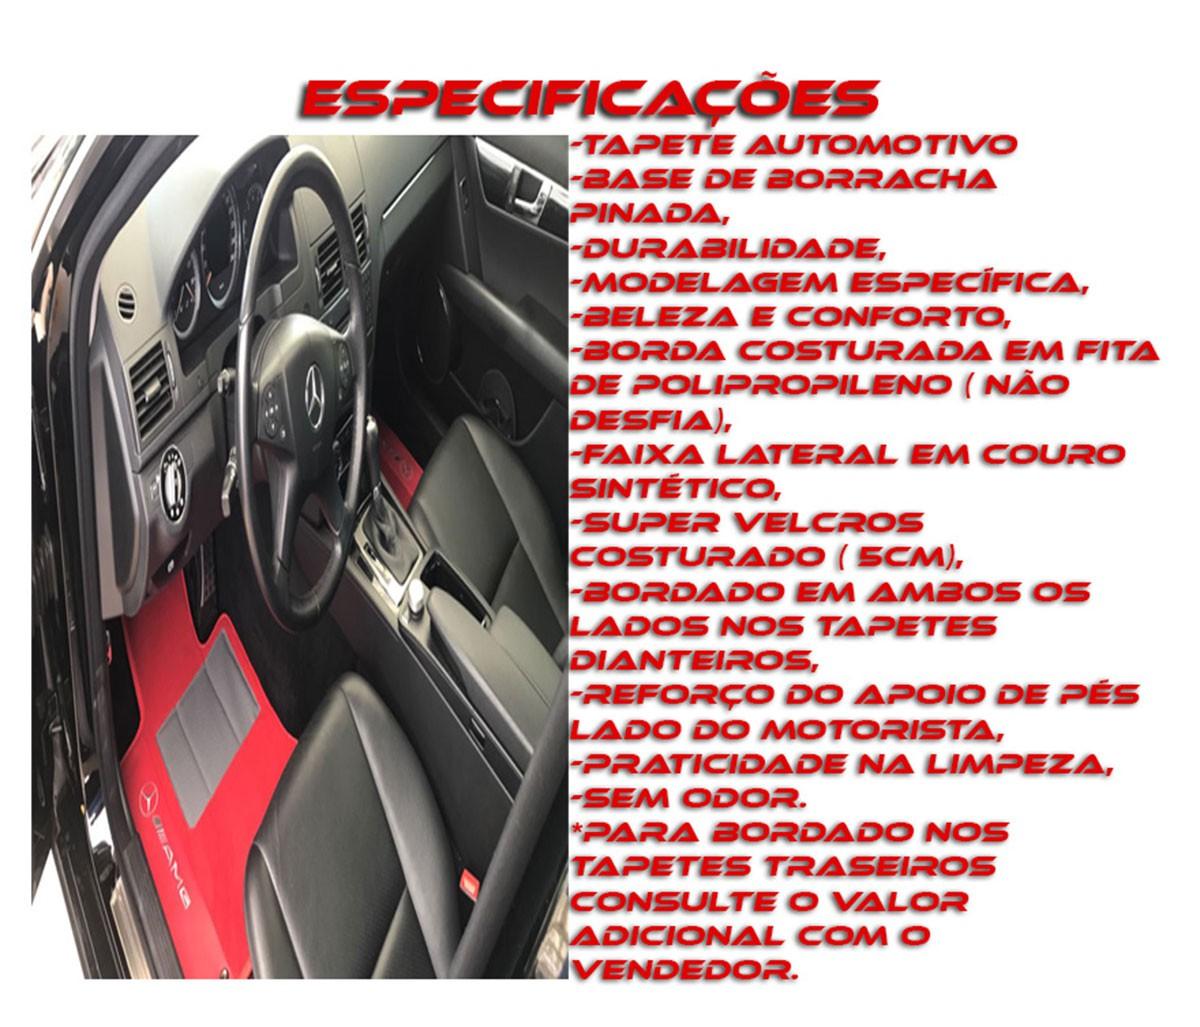 Kit Jogo De Tapetes+porta Malas Volvo Xc60 Carpete Luxo